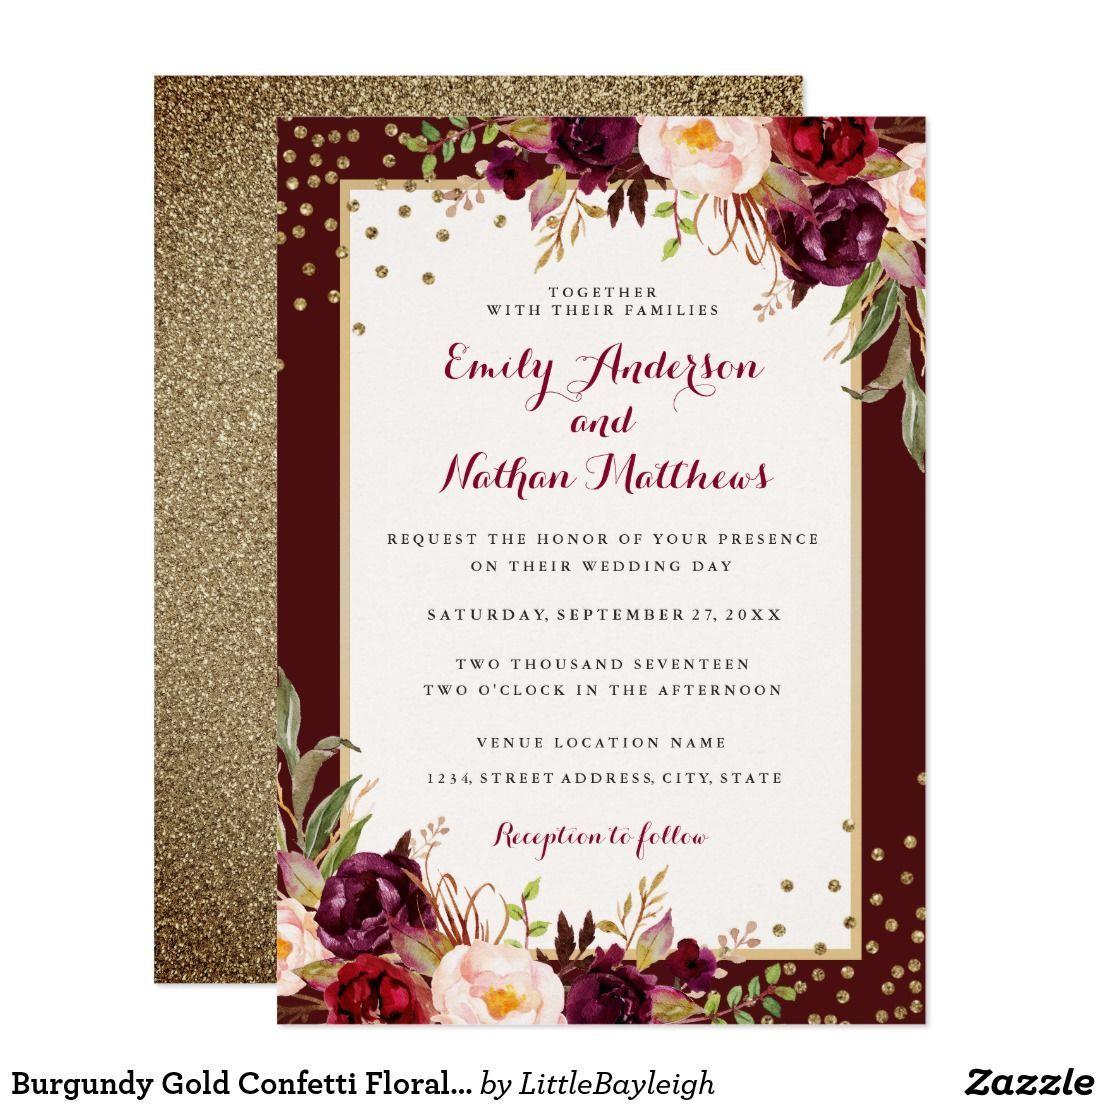 Maroon and white wedding decor  Burgundy Gold Confetti Floral Wedding Invitation  Wedding